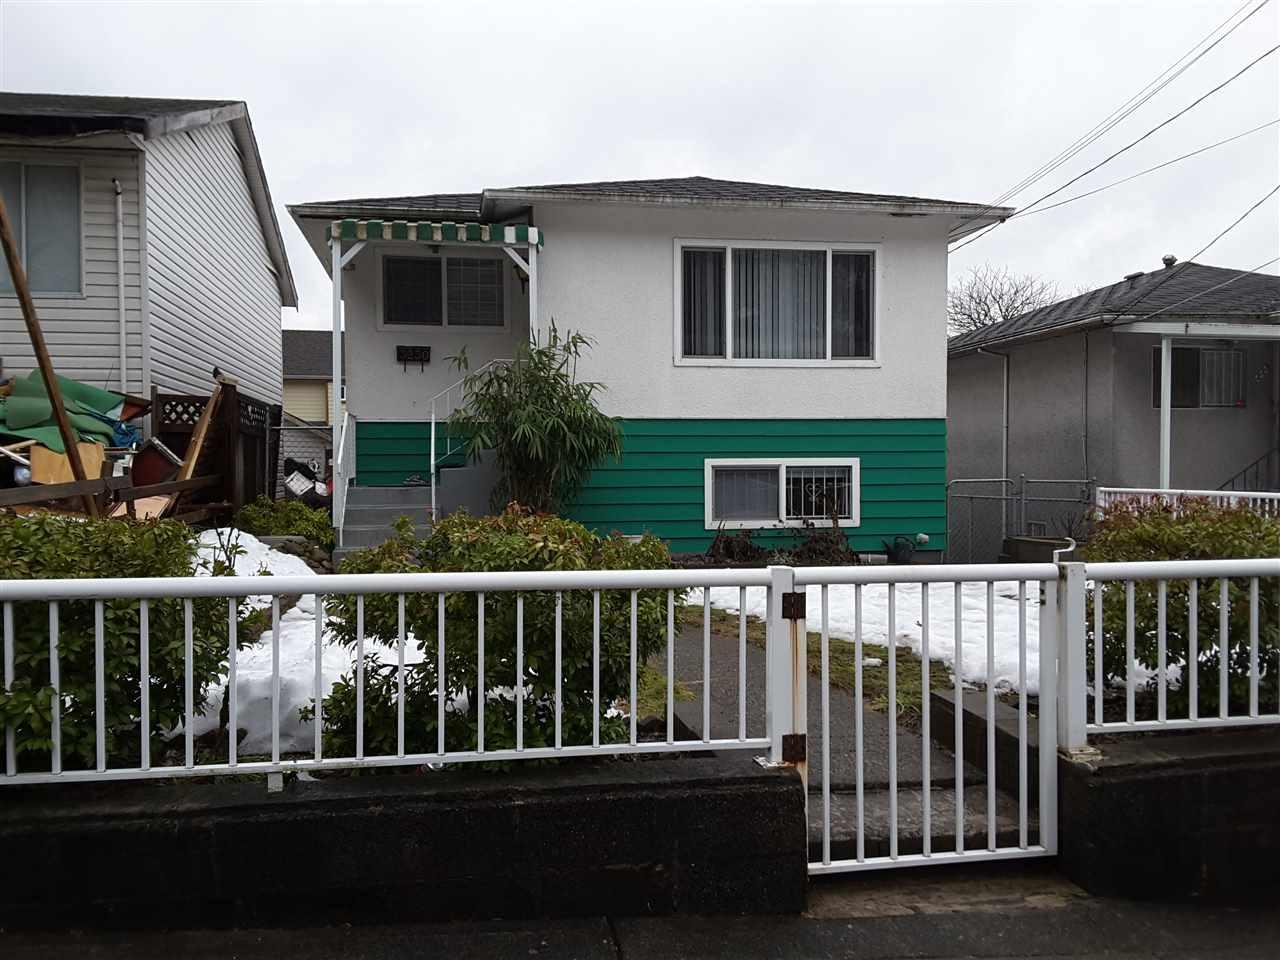 3230 VANNESS AVENUE, Vancouver, BC V5R 5A5